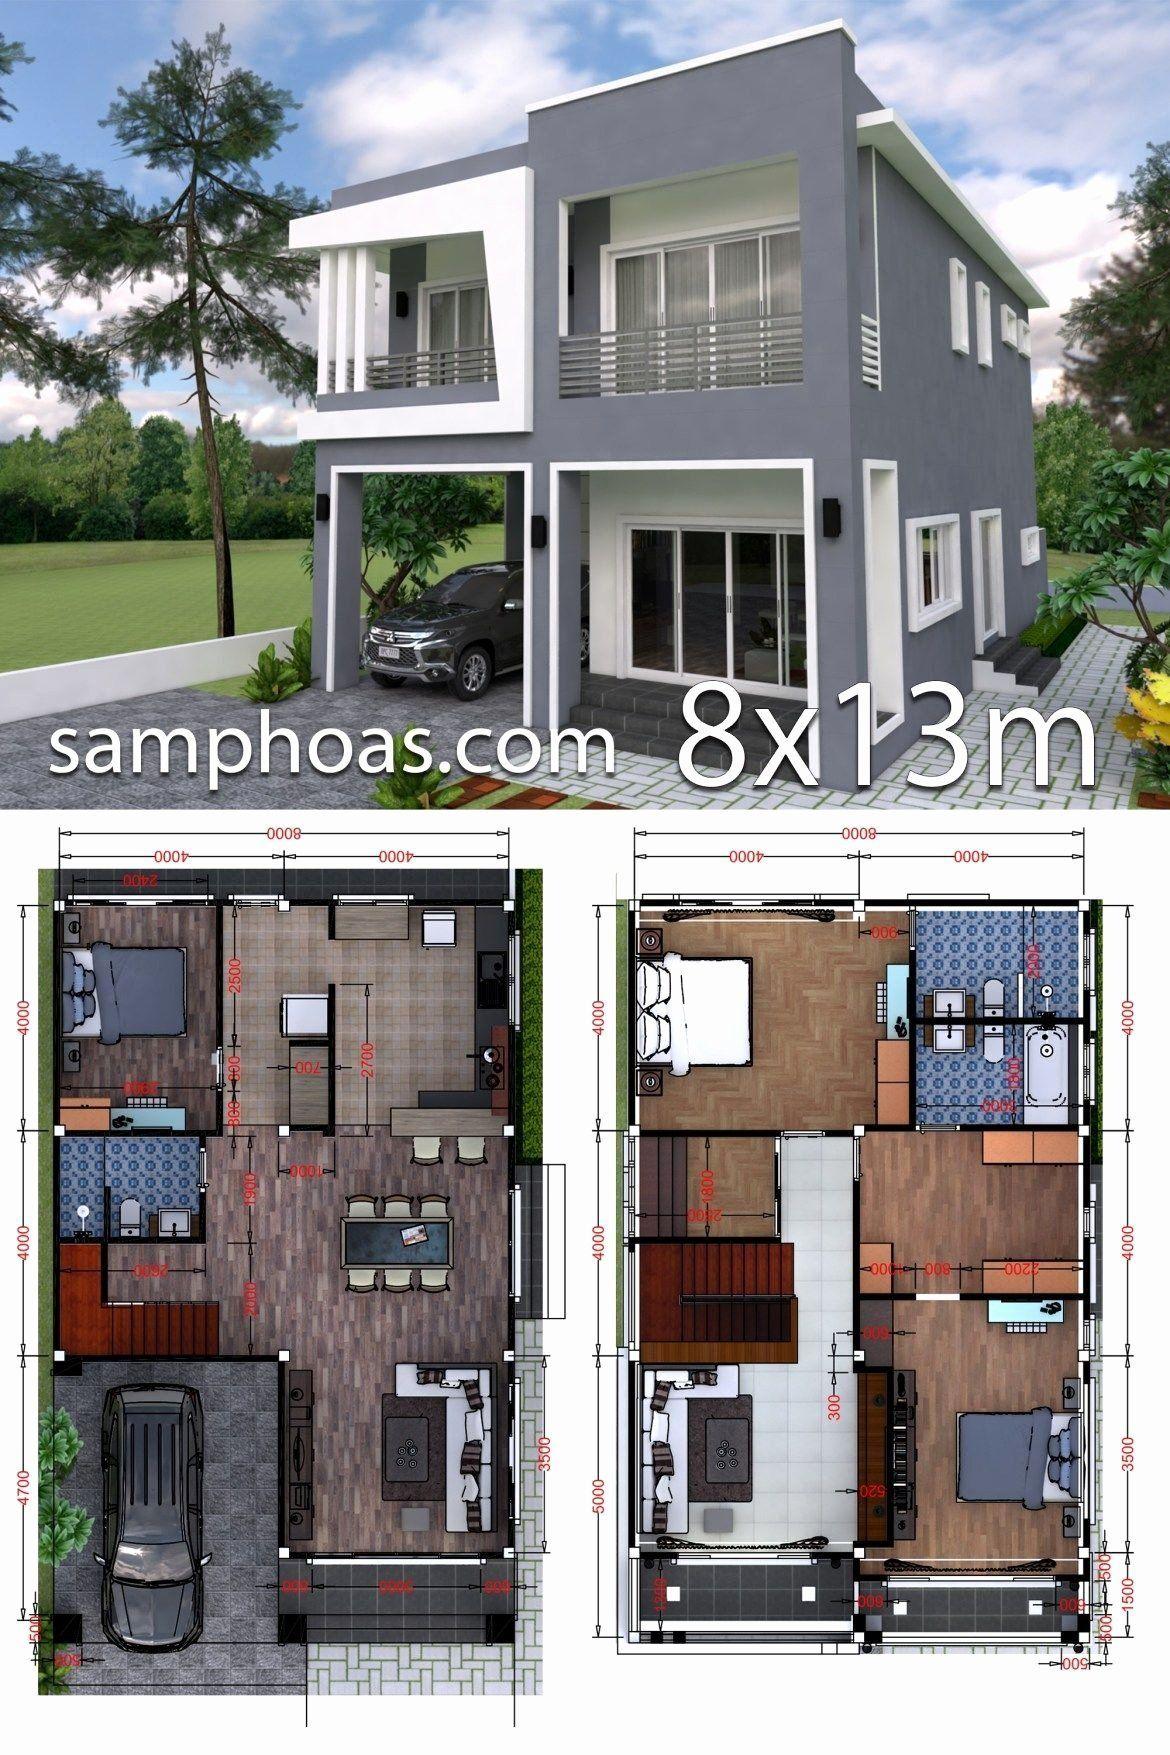 3d Home Design Suite Free Download Best Of Plan 3d Interior Design Home Plan 8x13m Full Plan 3beds 3d Home Design 3d Interior Design House Design